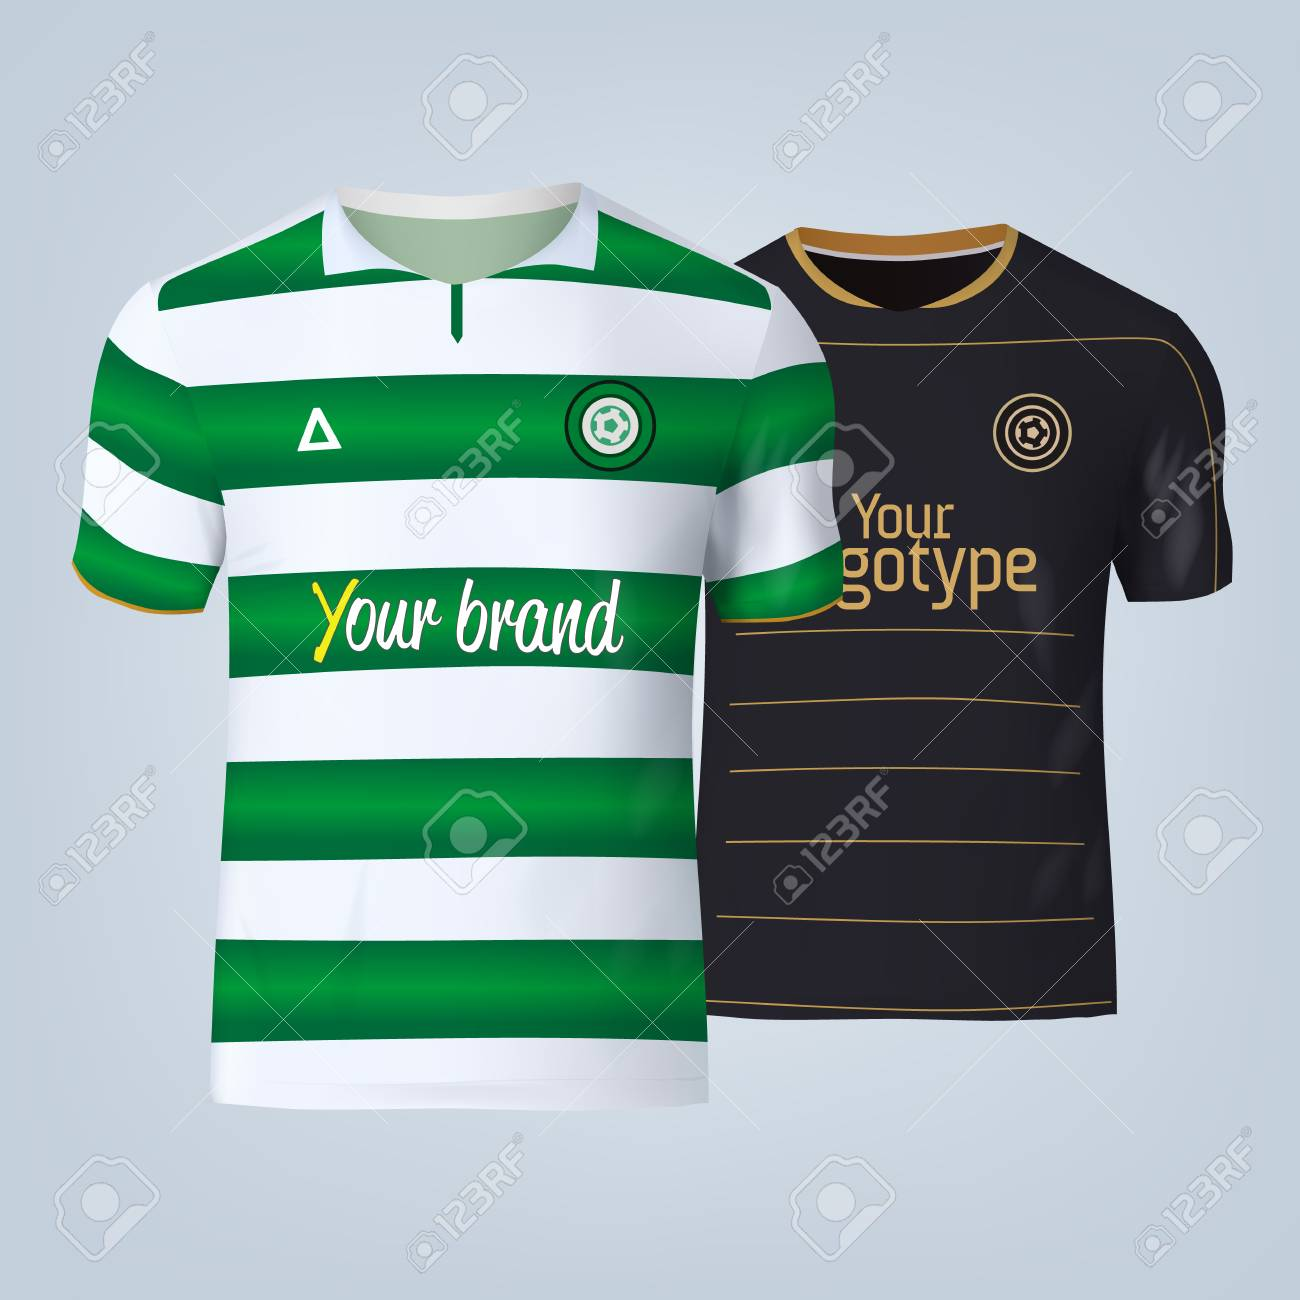 Vector illustration of football t-shirt template. - 84013134